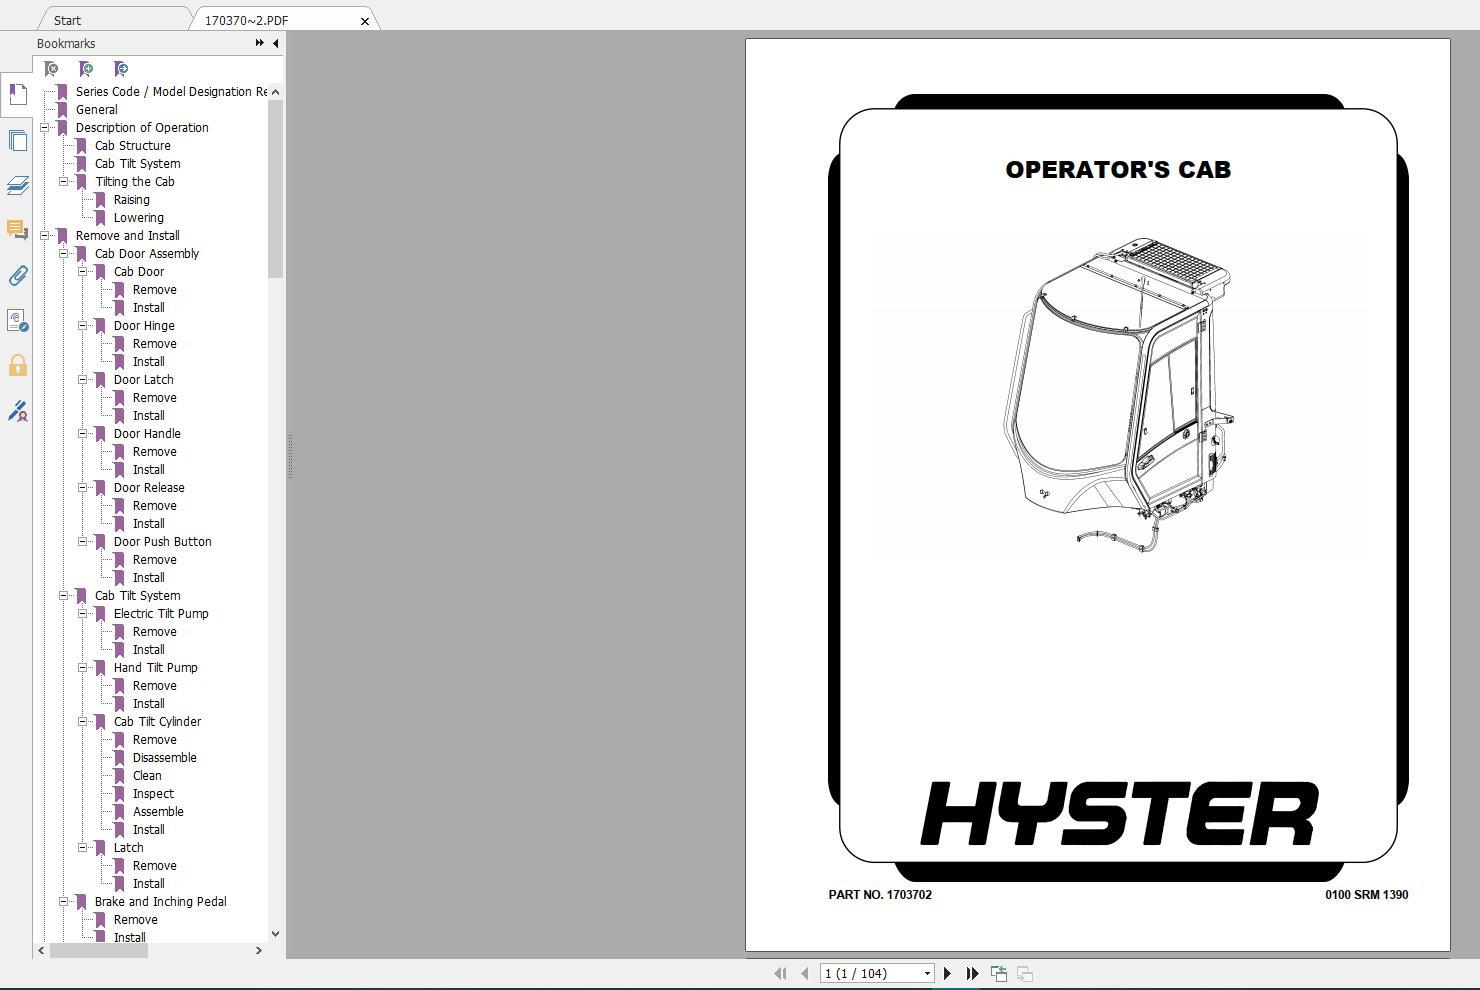 Hyster_Forklift_Class_5_Internal_Combustion_Engine_Trucks_Repair_Manuals6